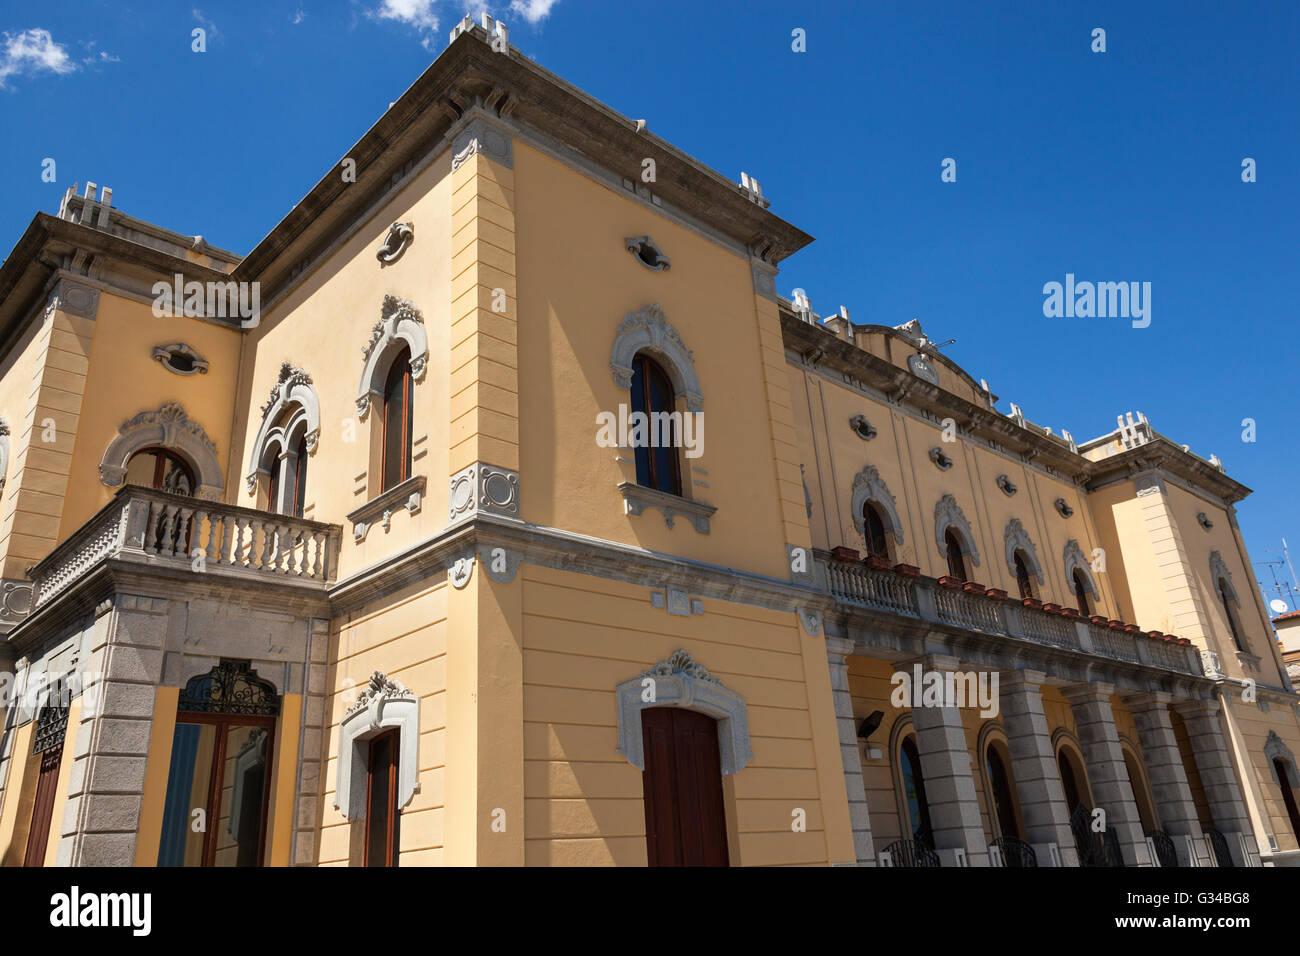 Town hall, Municipio Di Olbia, Olbia, Sardinia, Italy - Stock Image